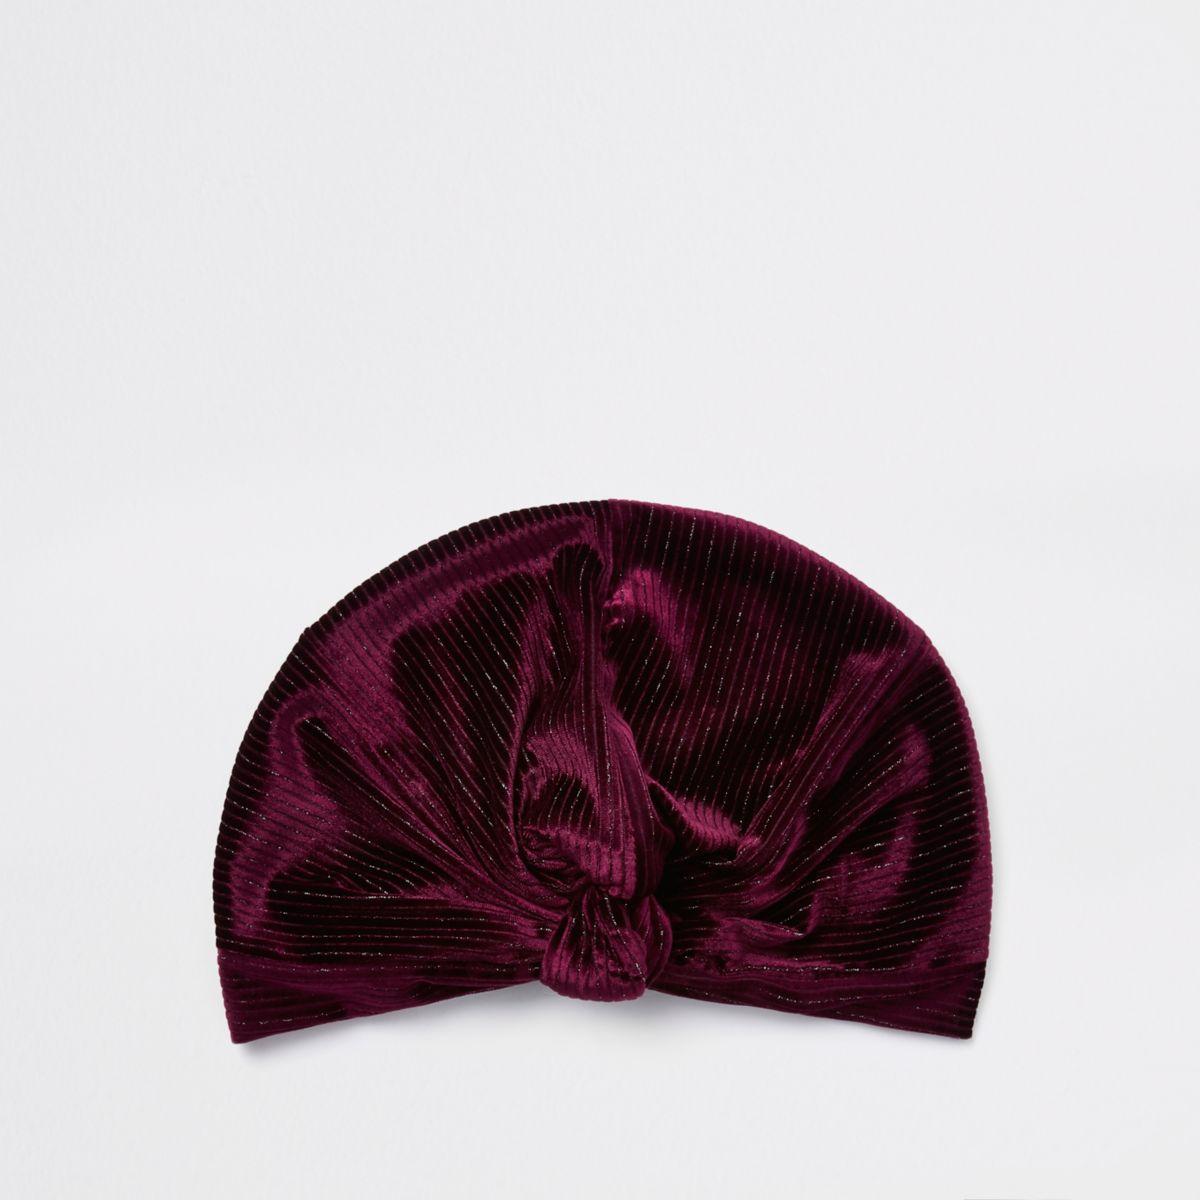 Burgundy plisse velvet twist turban headband